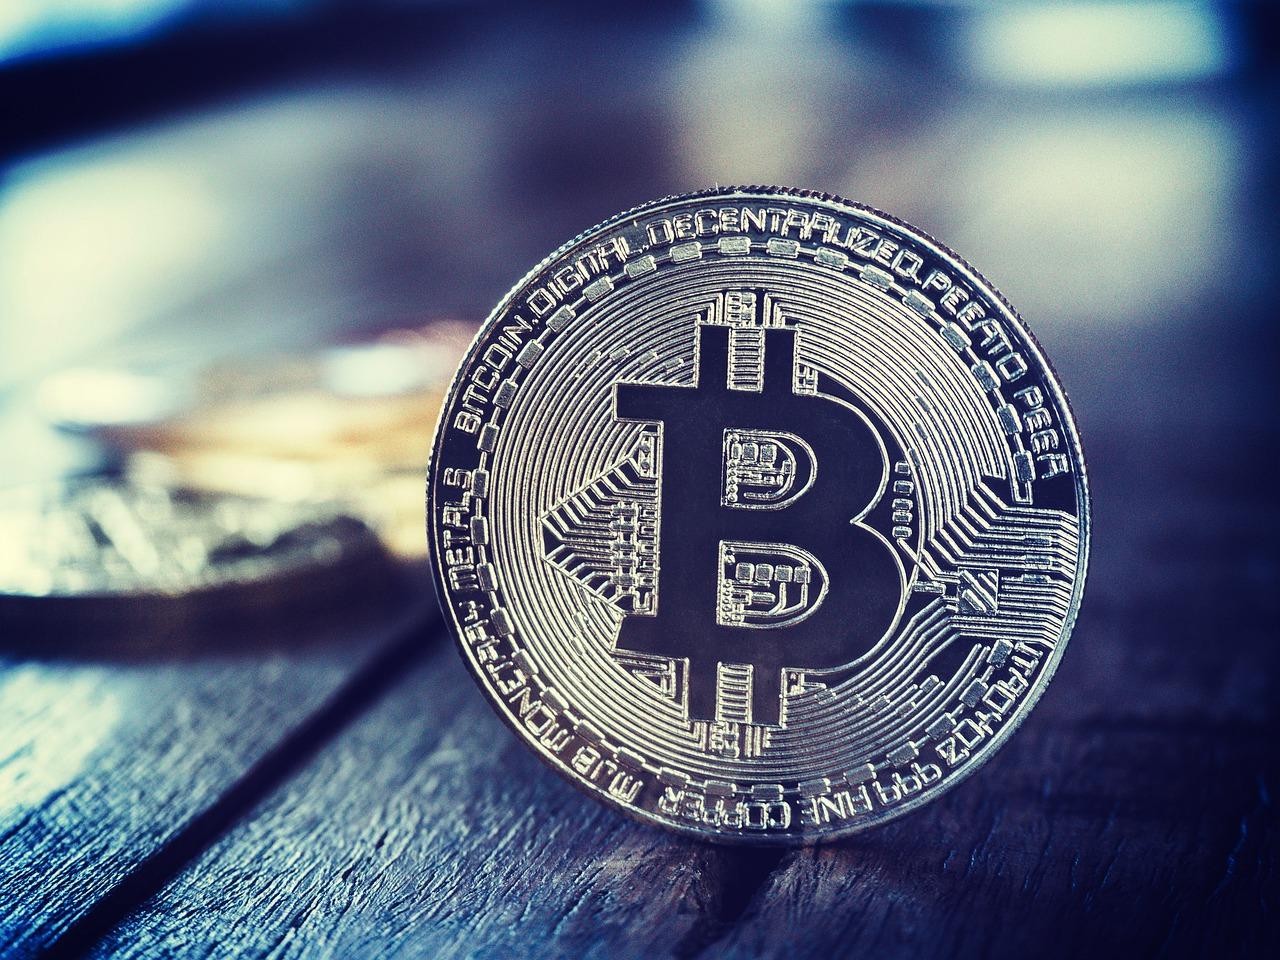 Ist Bitcoin, der absturzt oder korrigiert